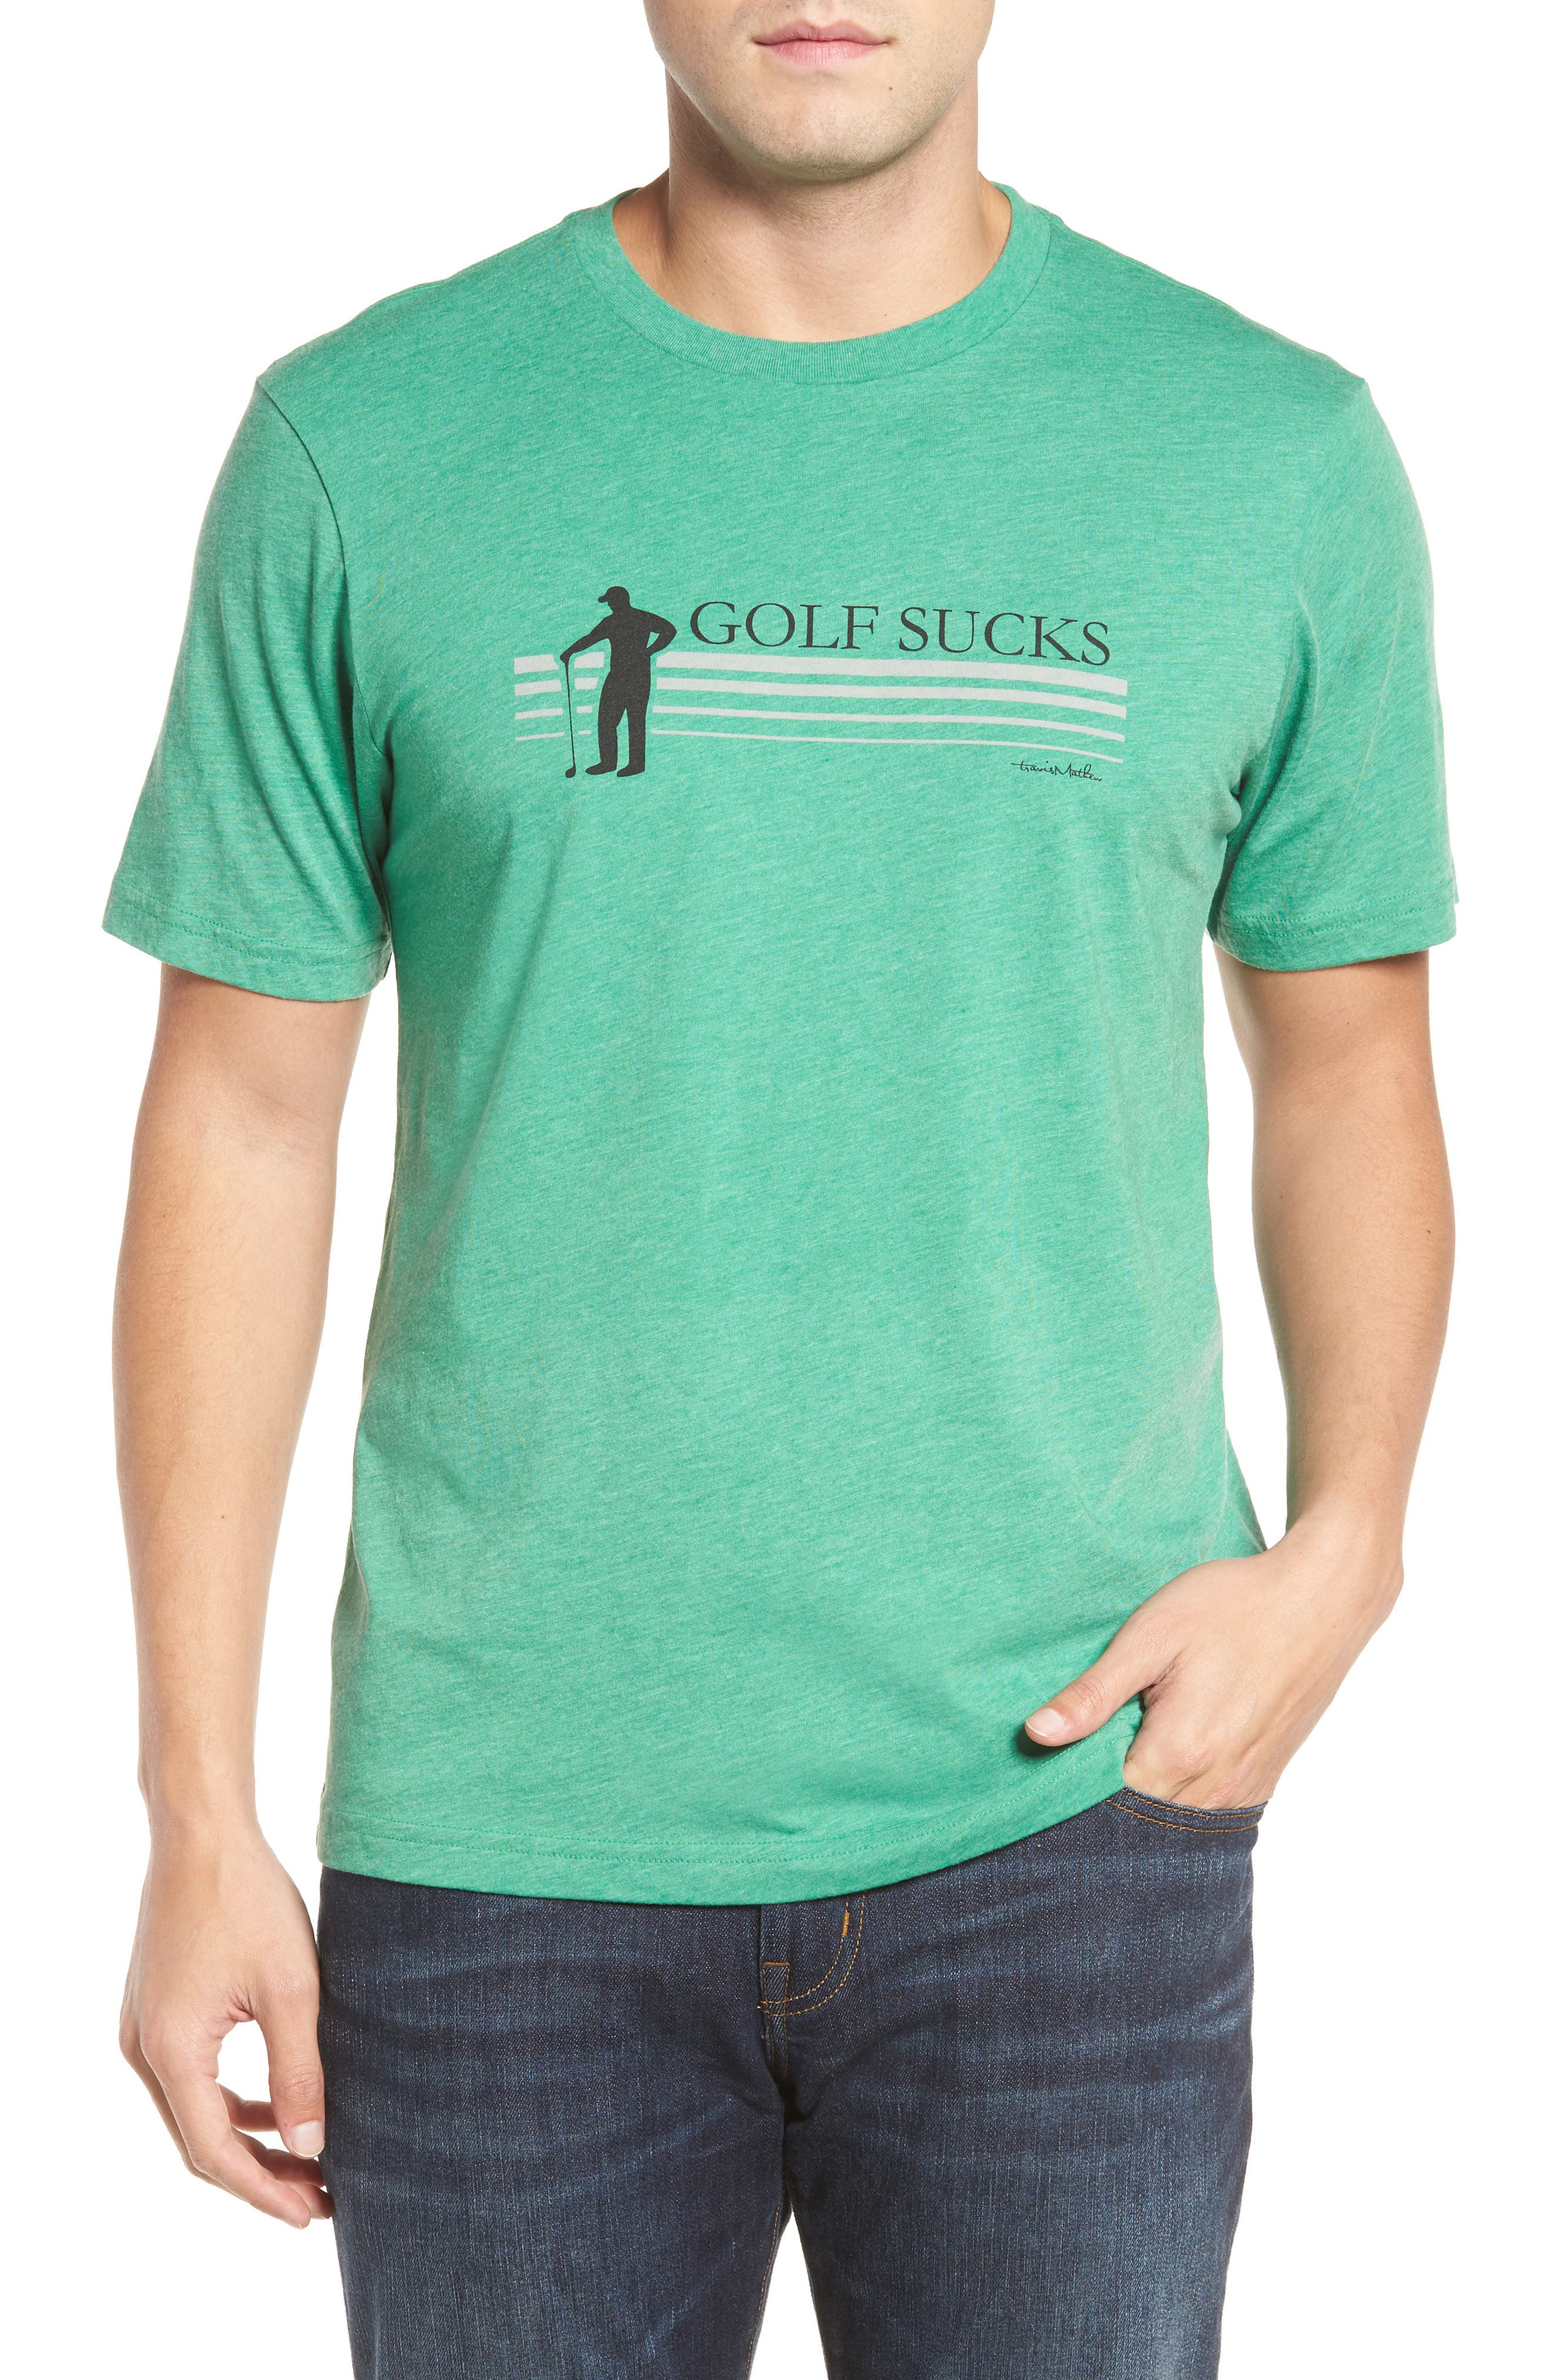 Jason T-Shirt,                         Main,                         color, 300